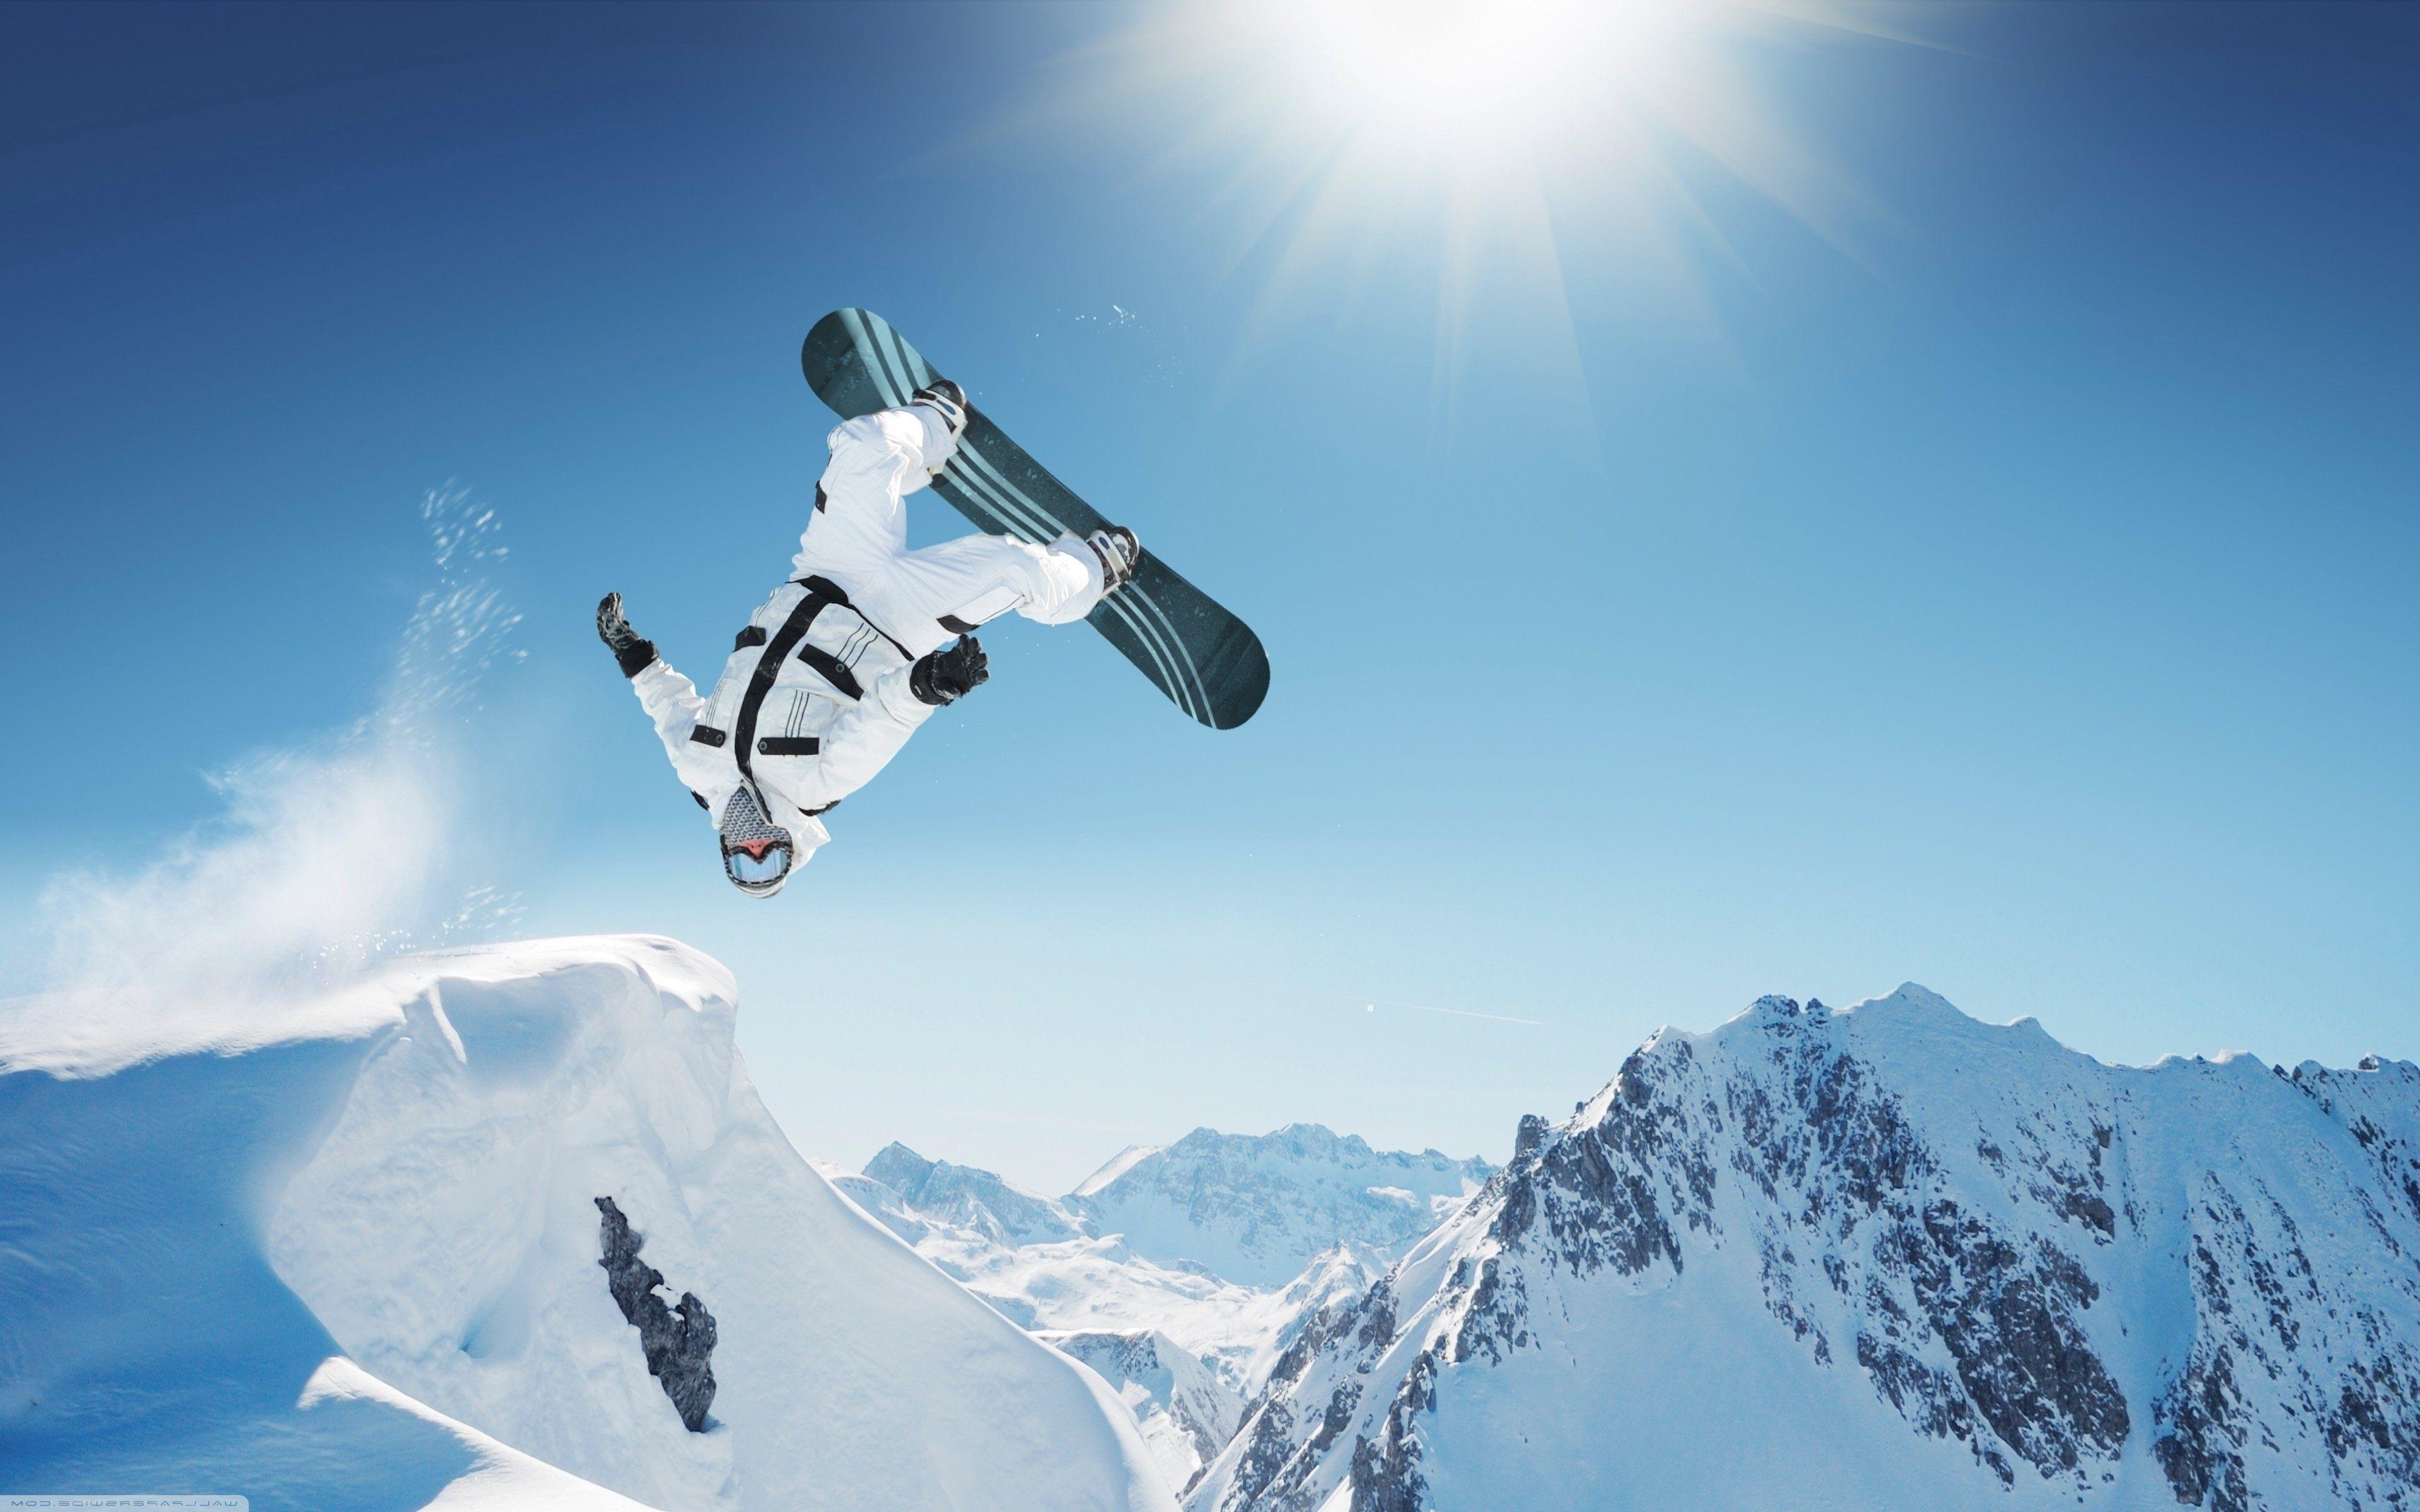 Ski Jumping Speed Winter Sport Wallpaper Hd Free Download Sport Hintergrundbilder Extremsport Snowboards